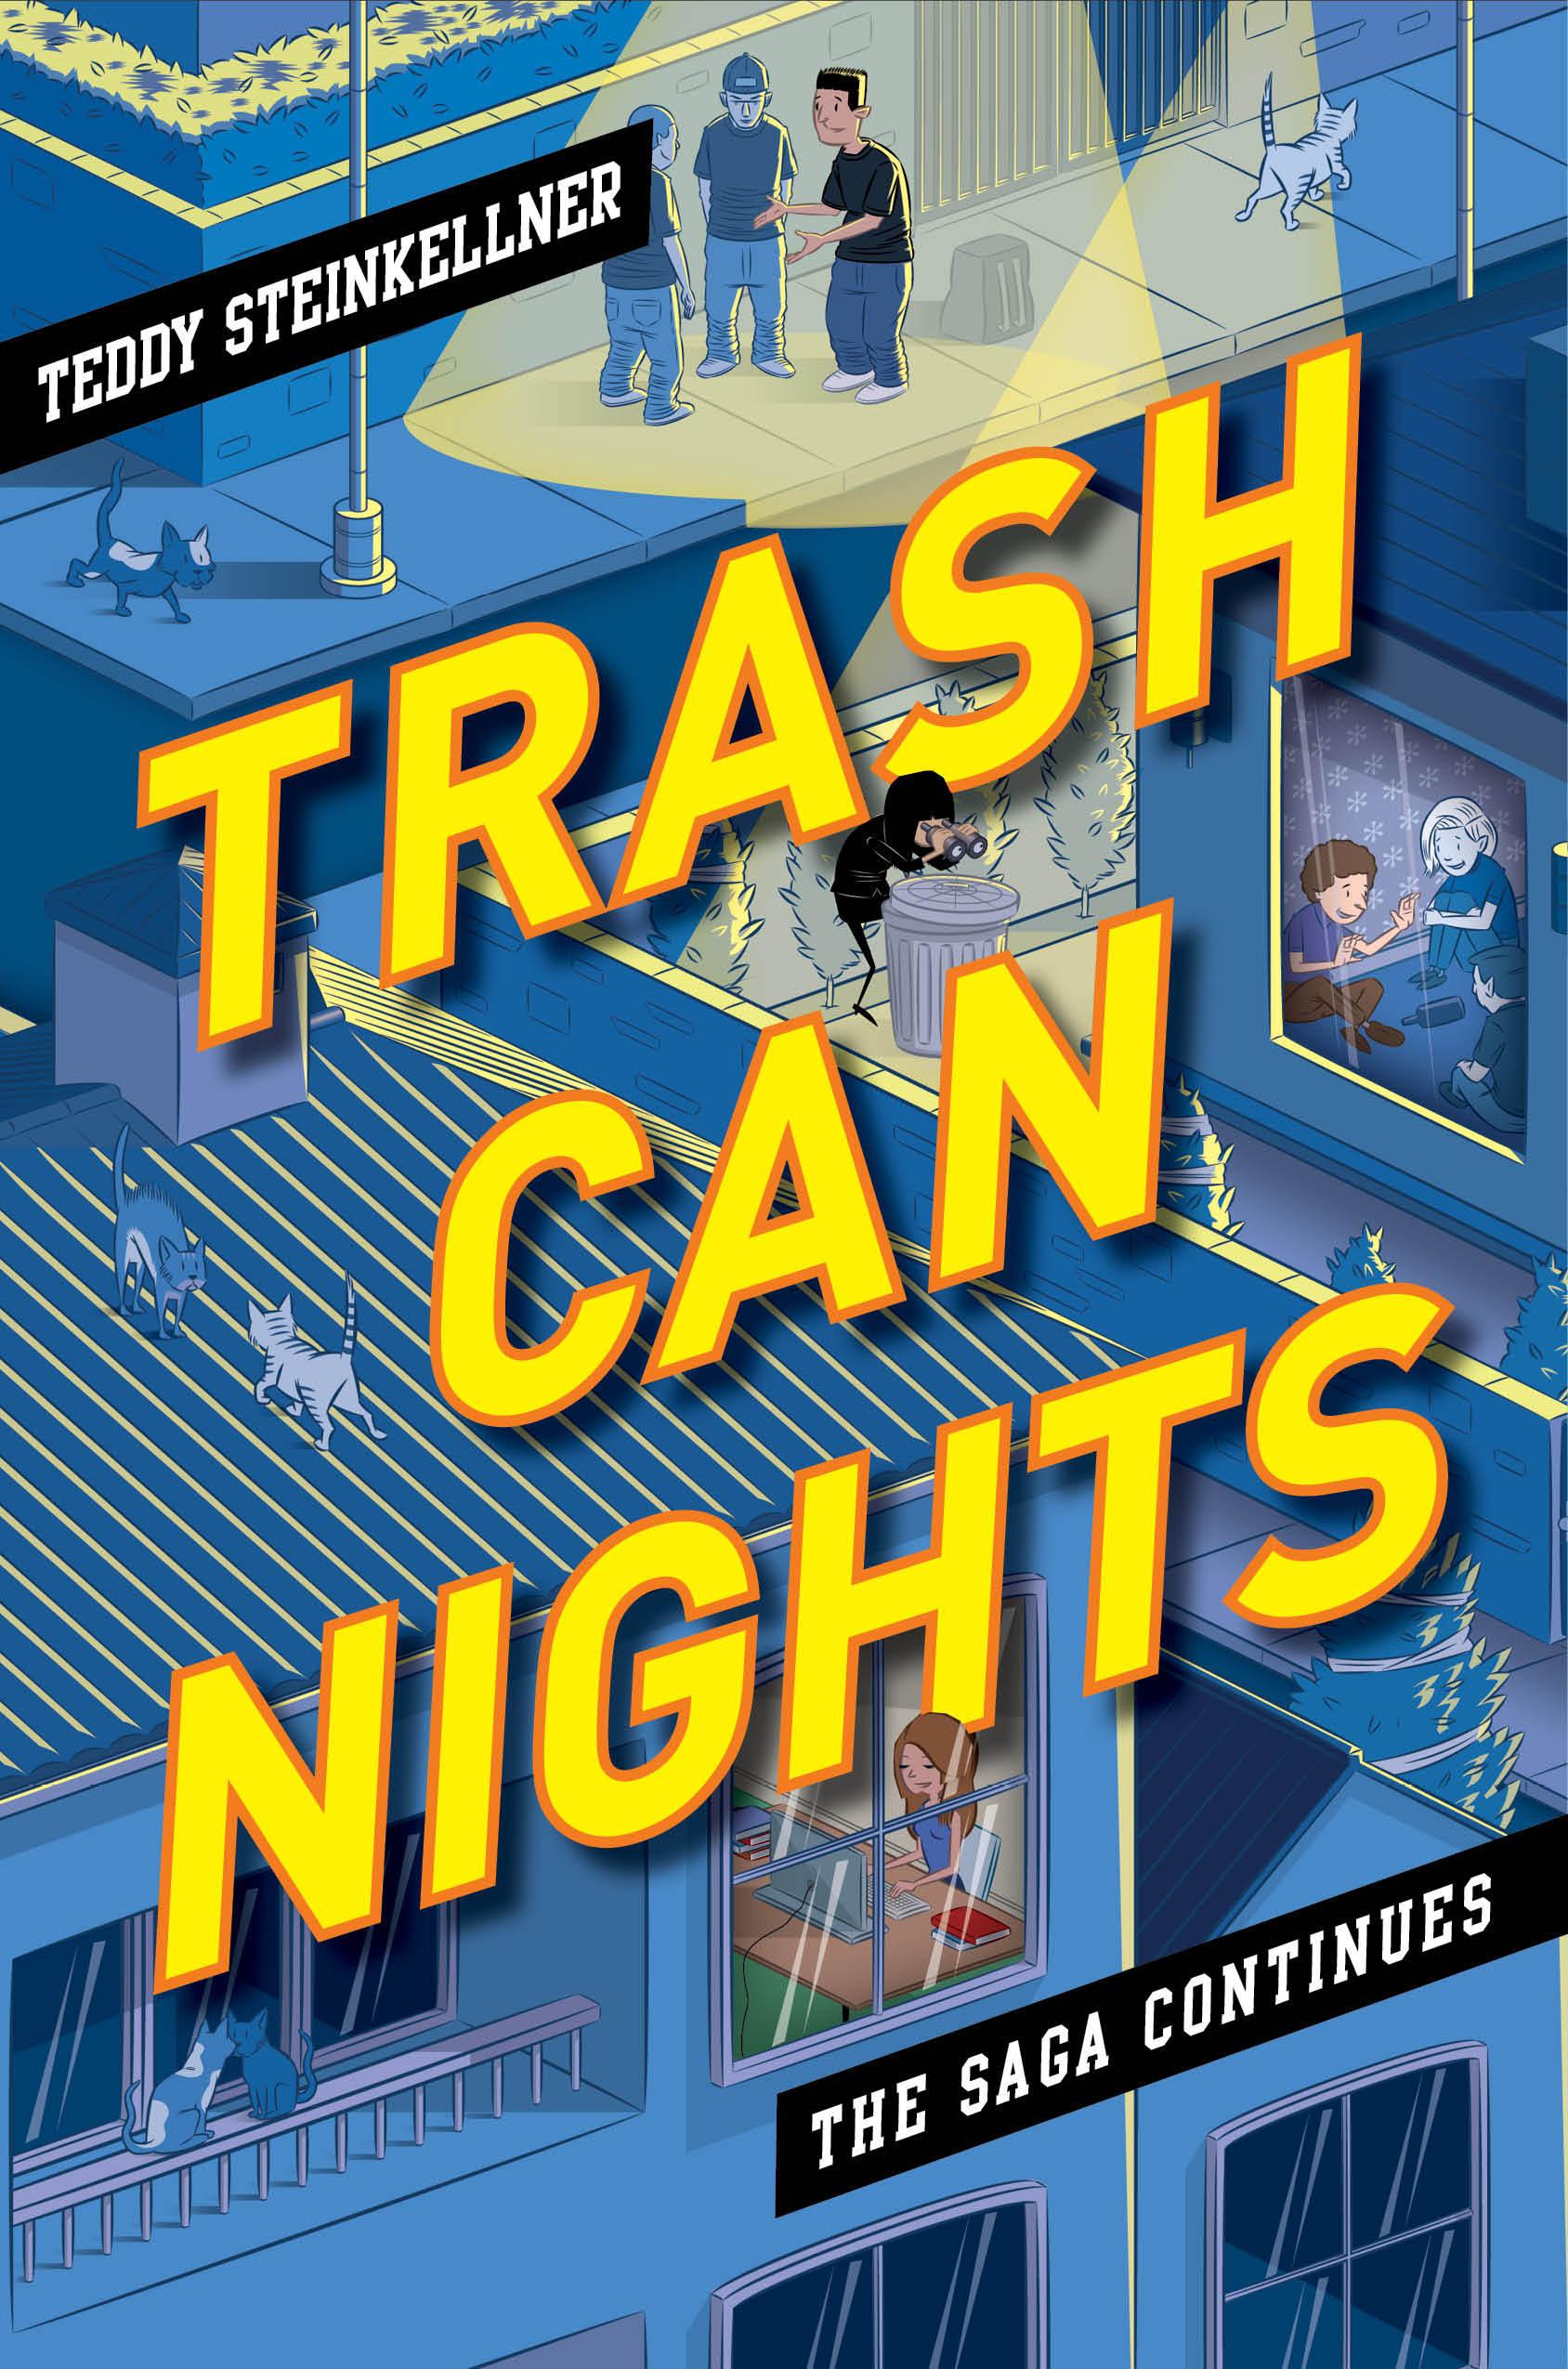 TrashCanNights-3.jpg